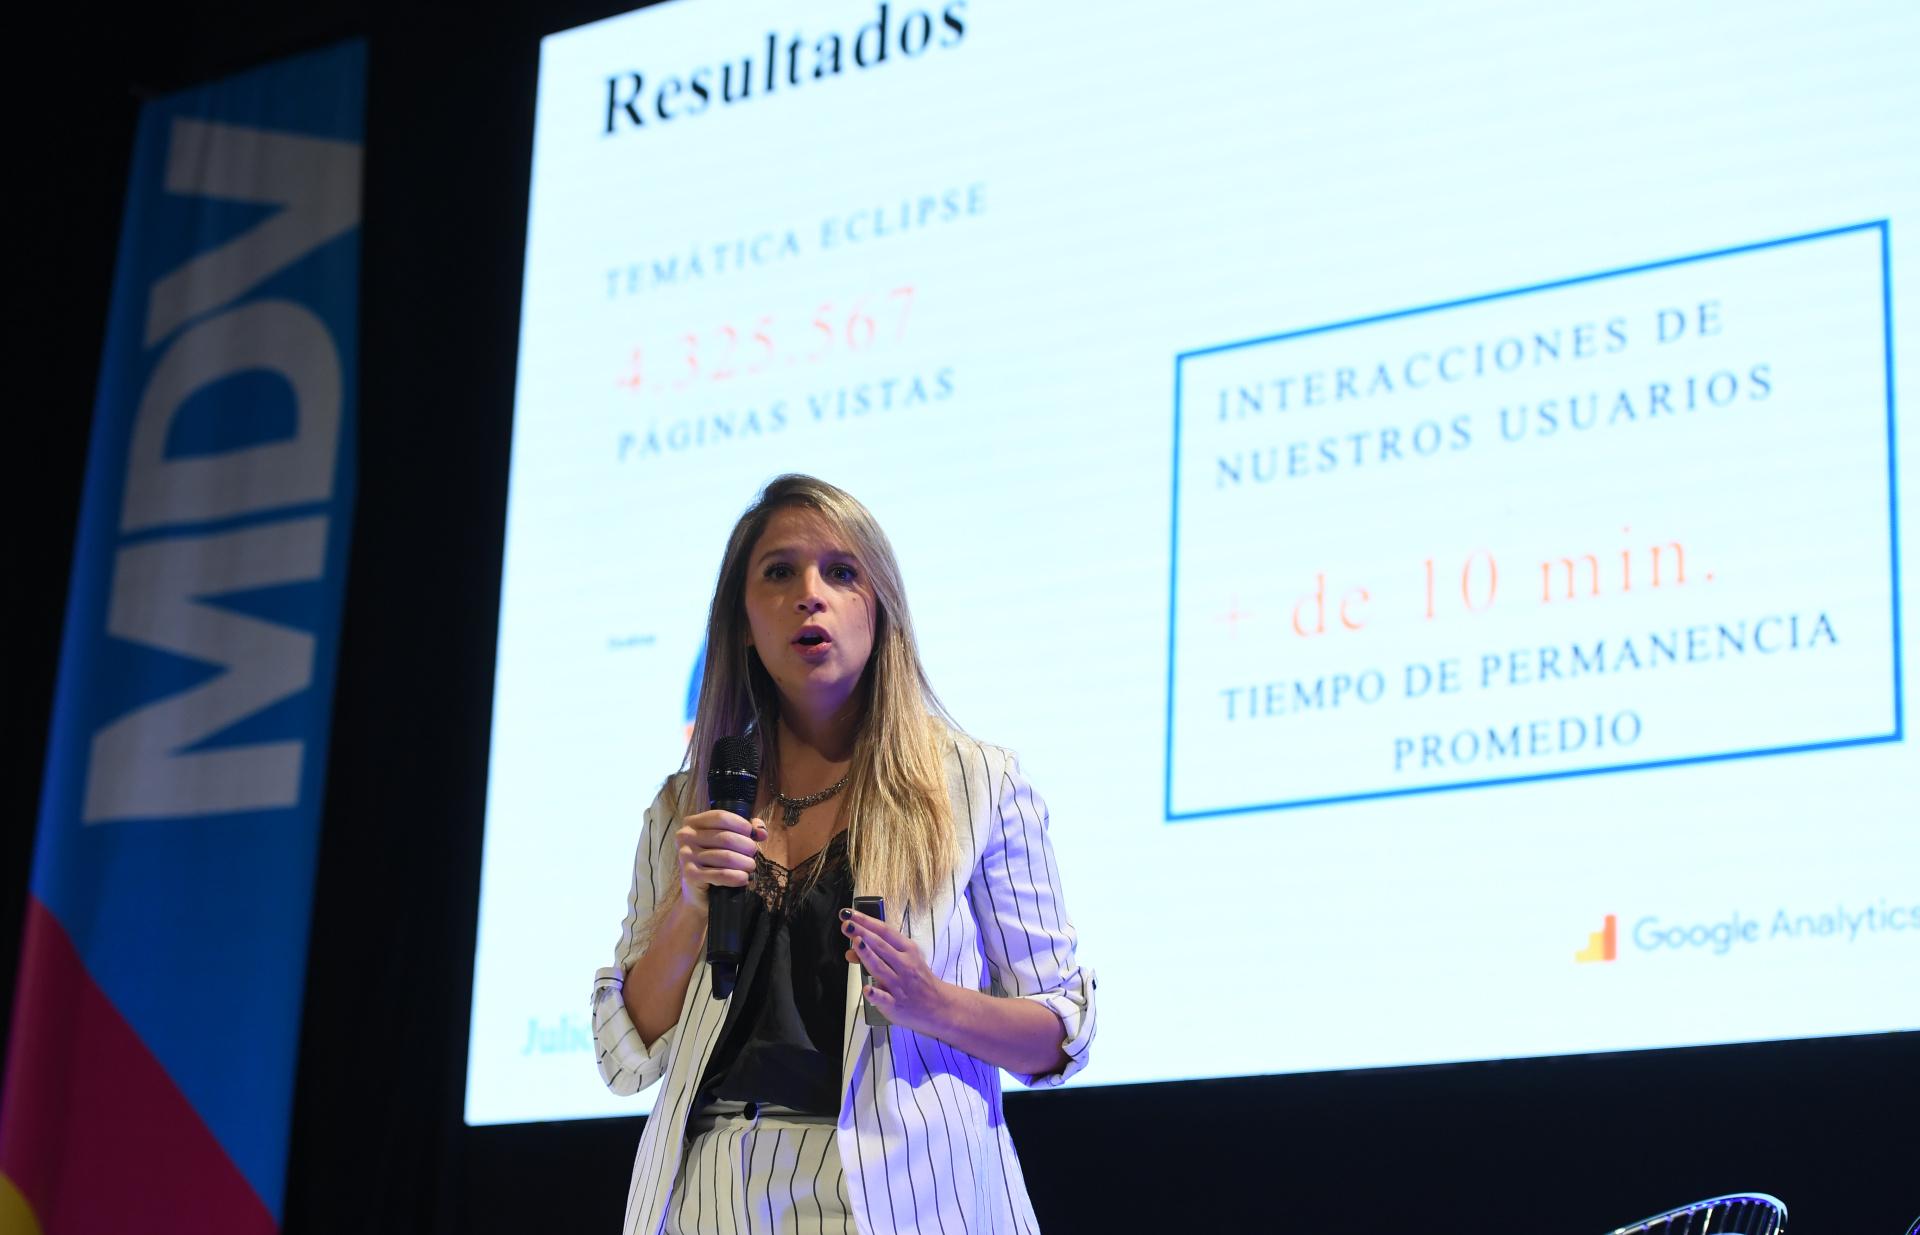 Mariana Genolet, gerente de Branded Content de Infobae